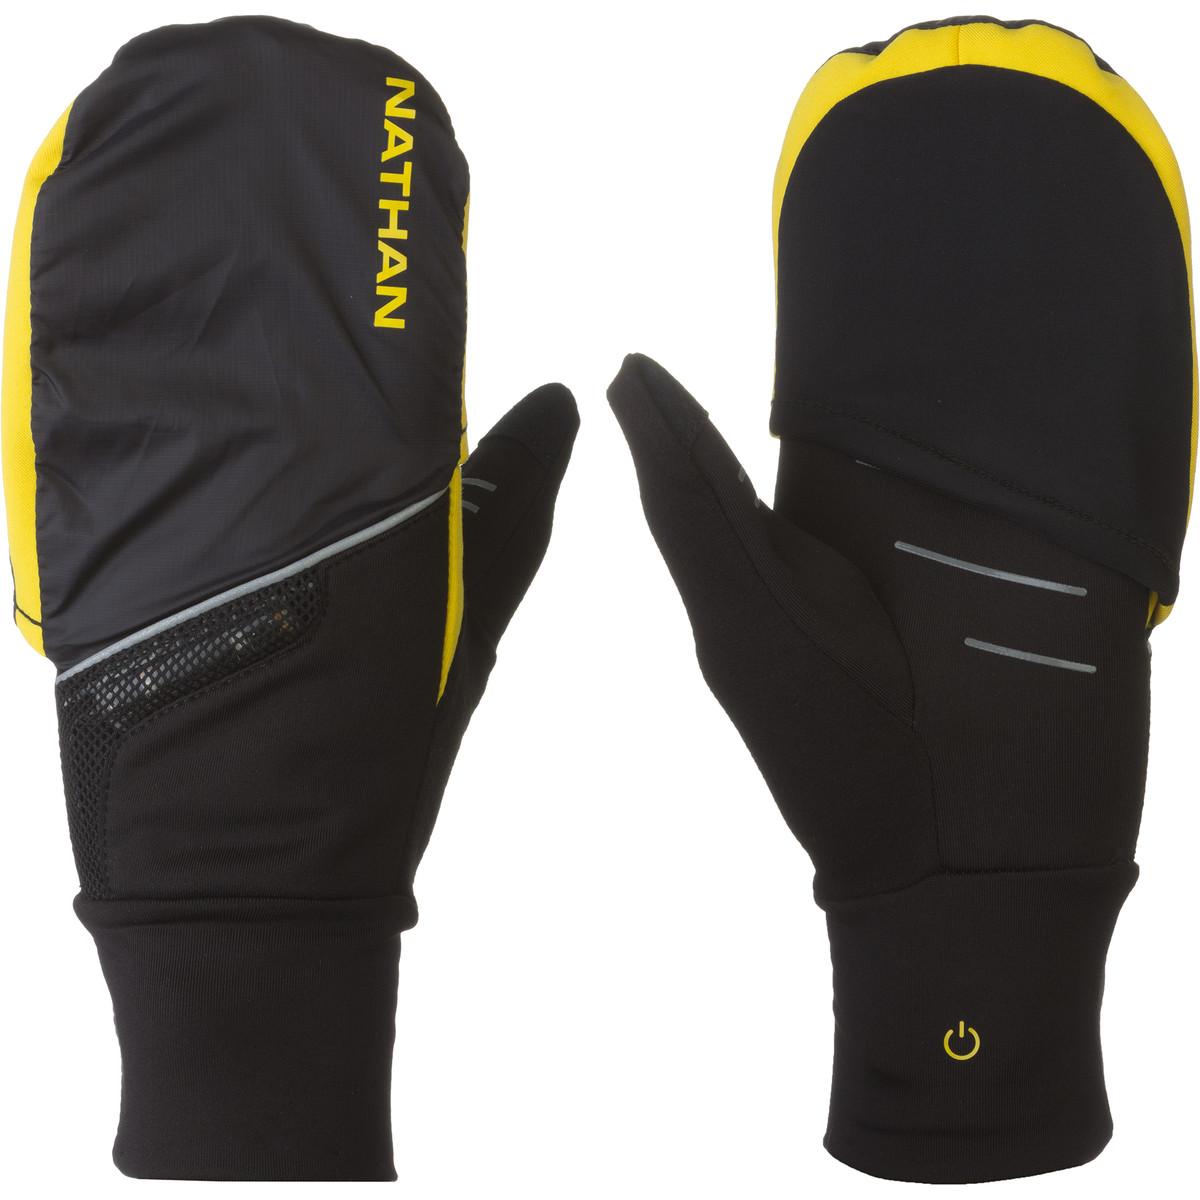 Nathan TransWarmer Convertible Glove/Mitt